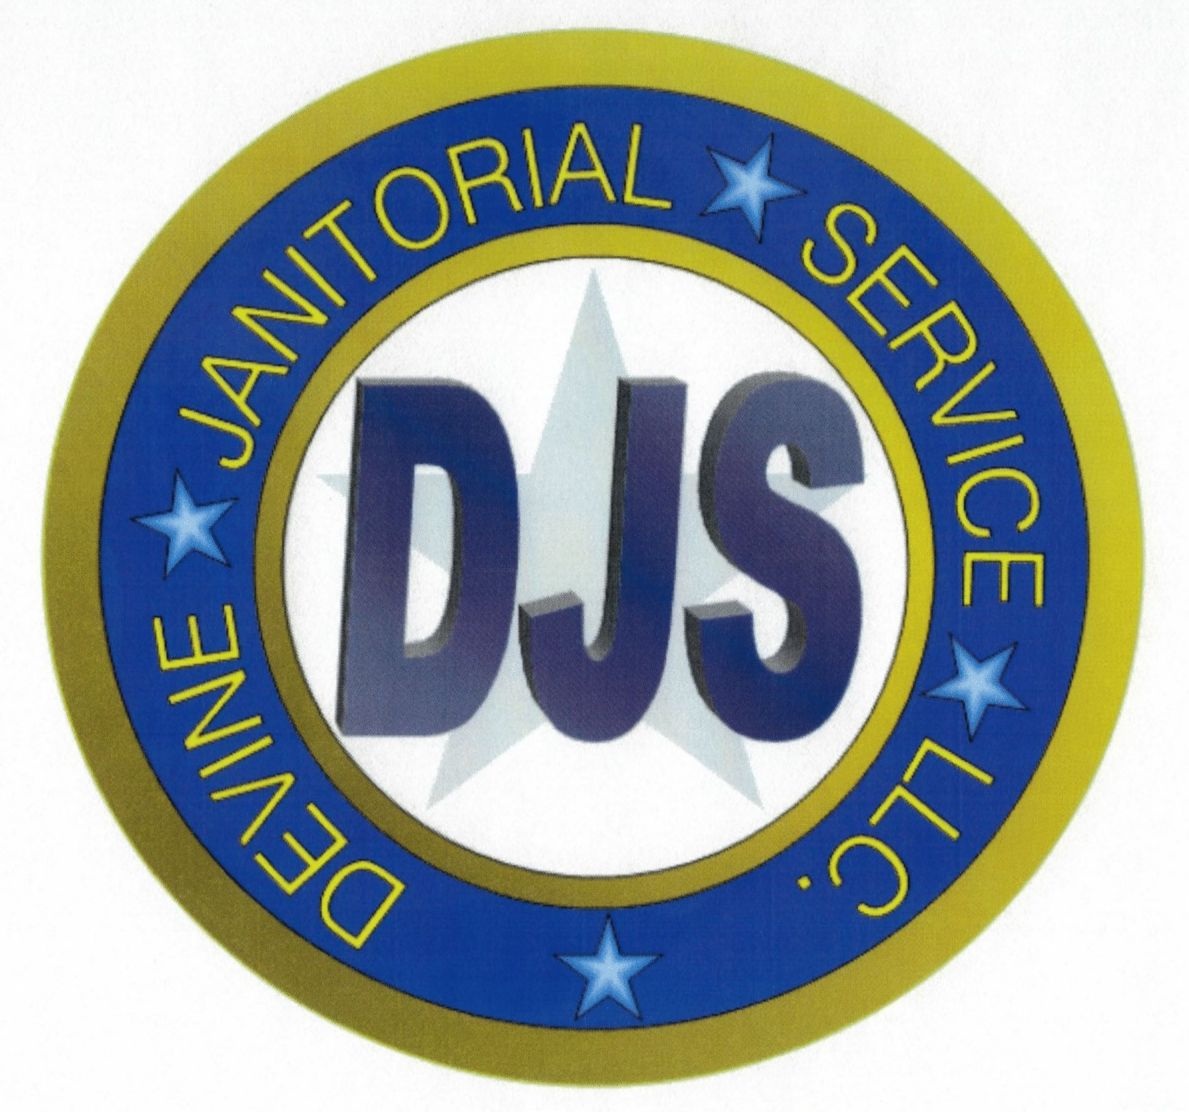 Silver Sponsor Devine Janitorial Services